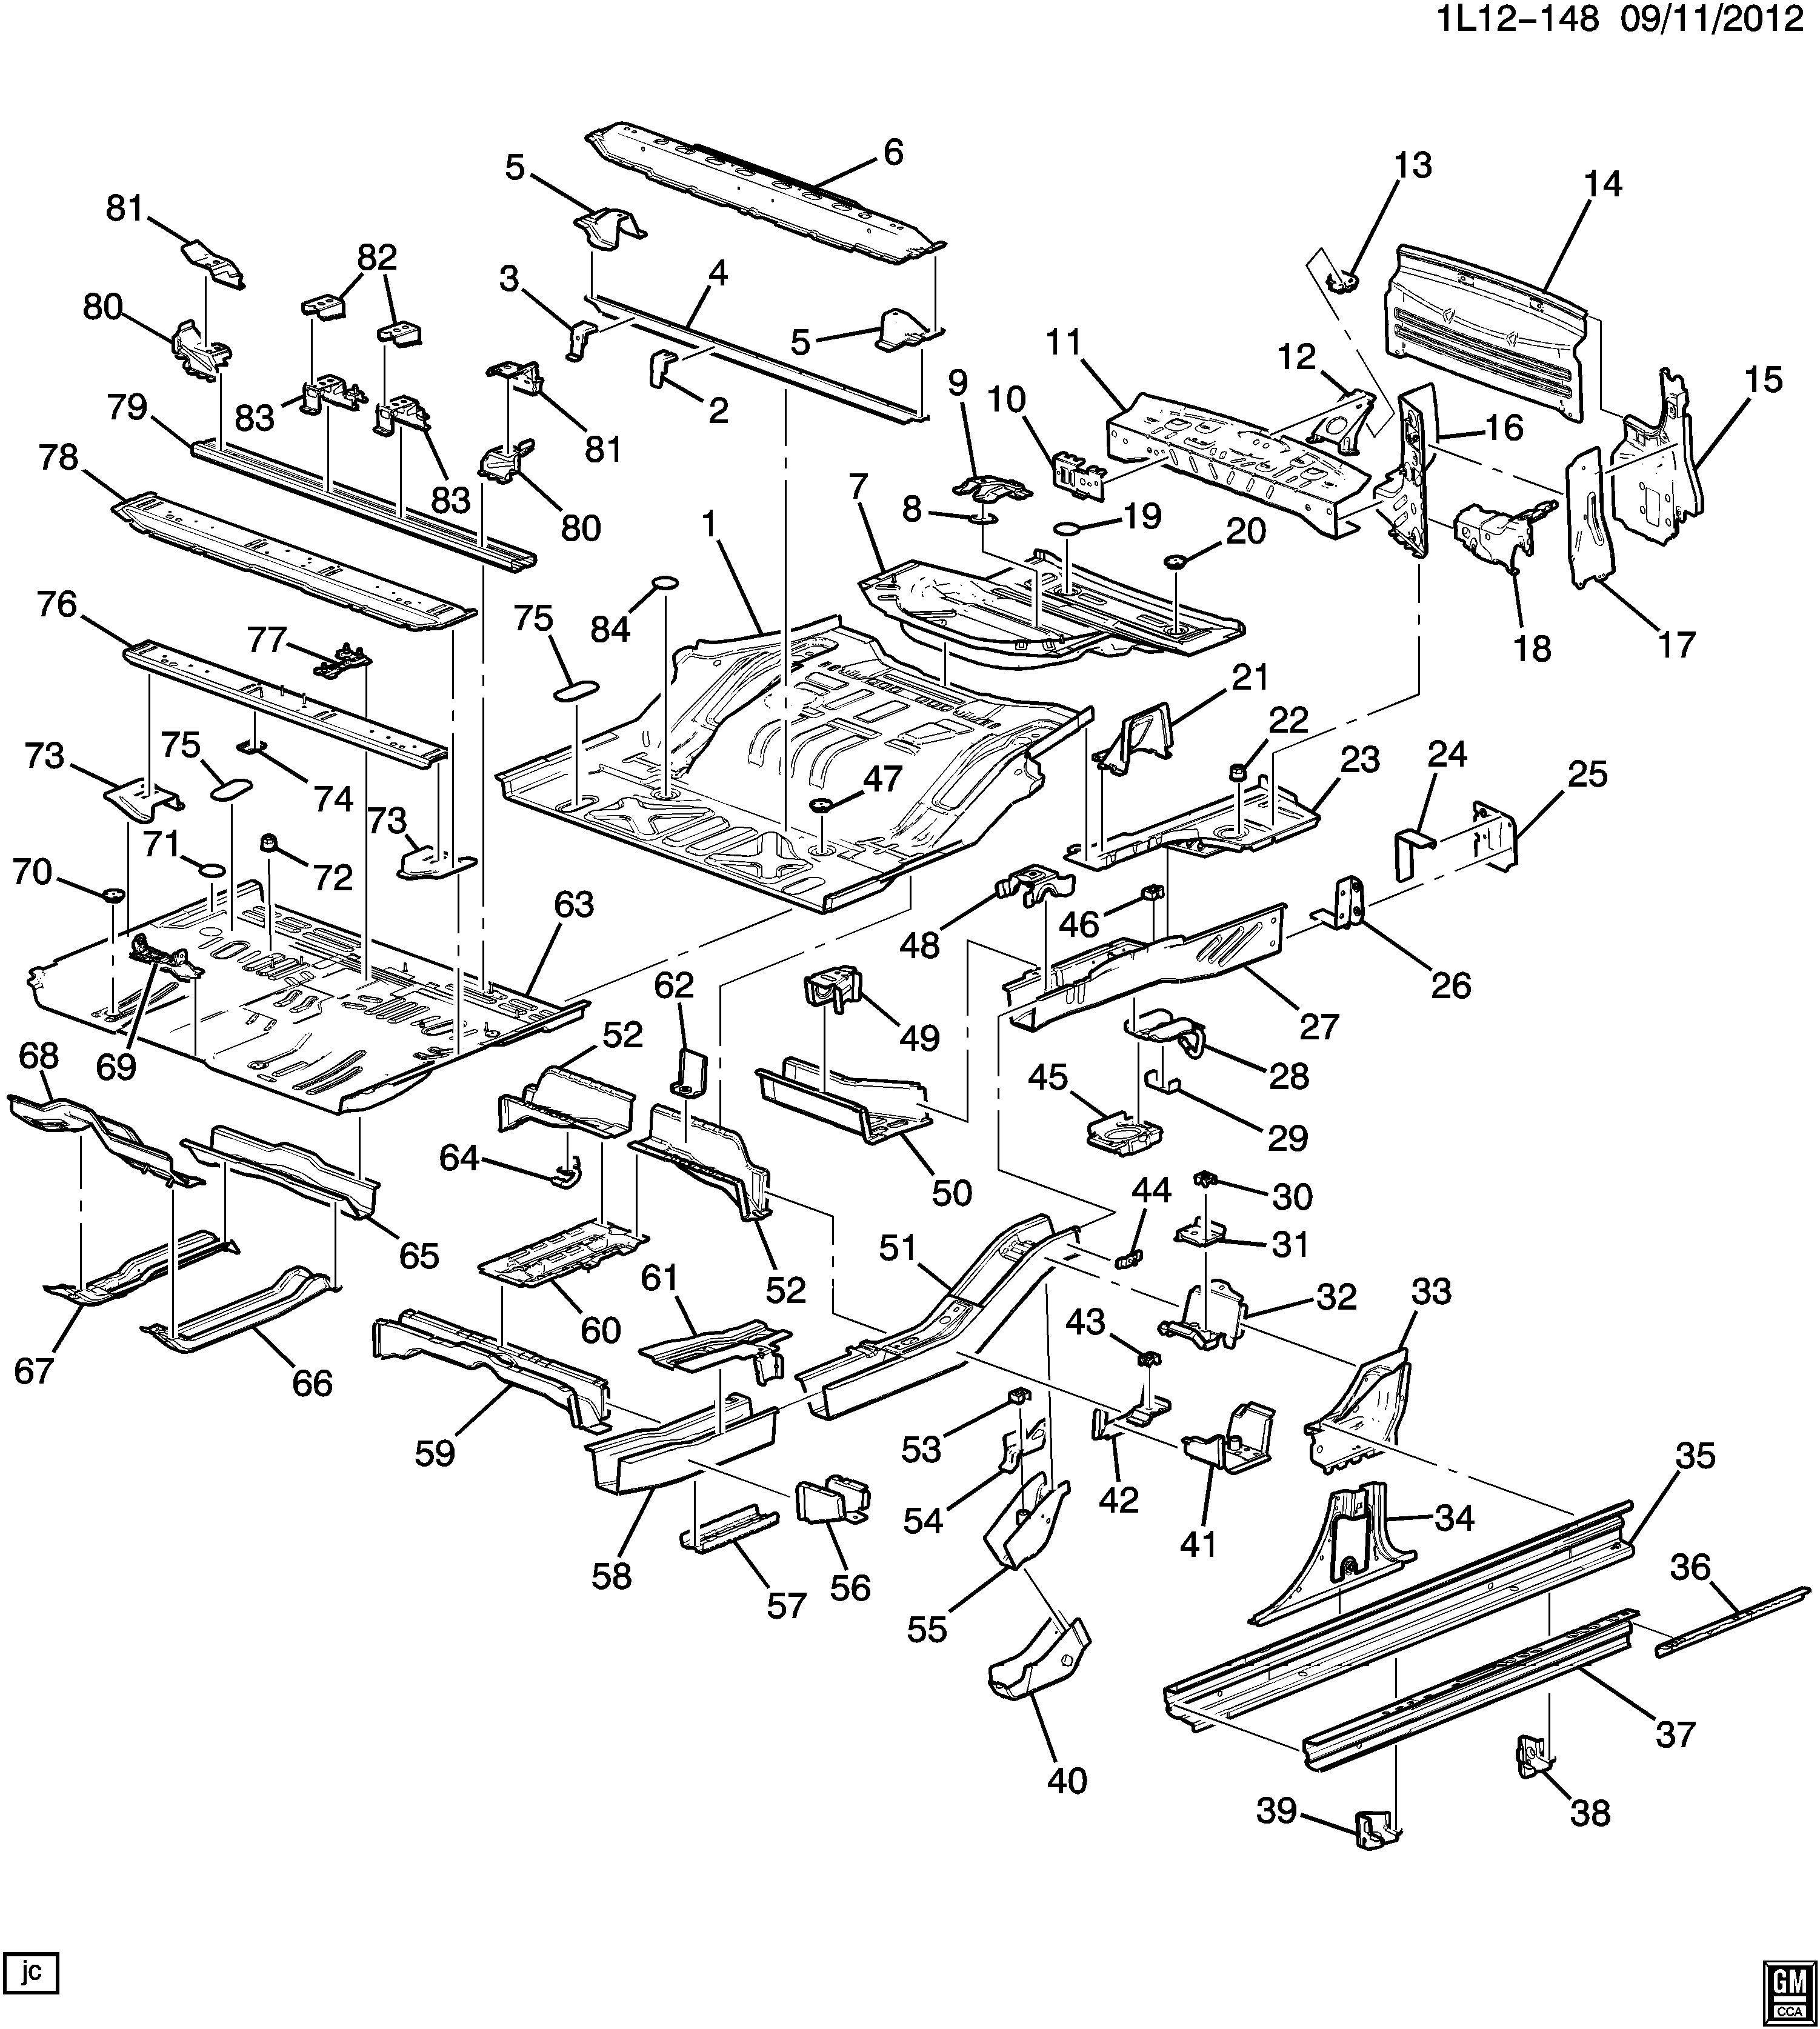 Chevrolet Equinox Bracket. Shock absorber/strut. Bracket